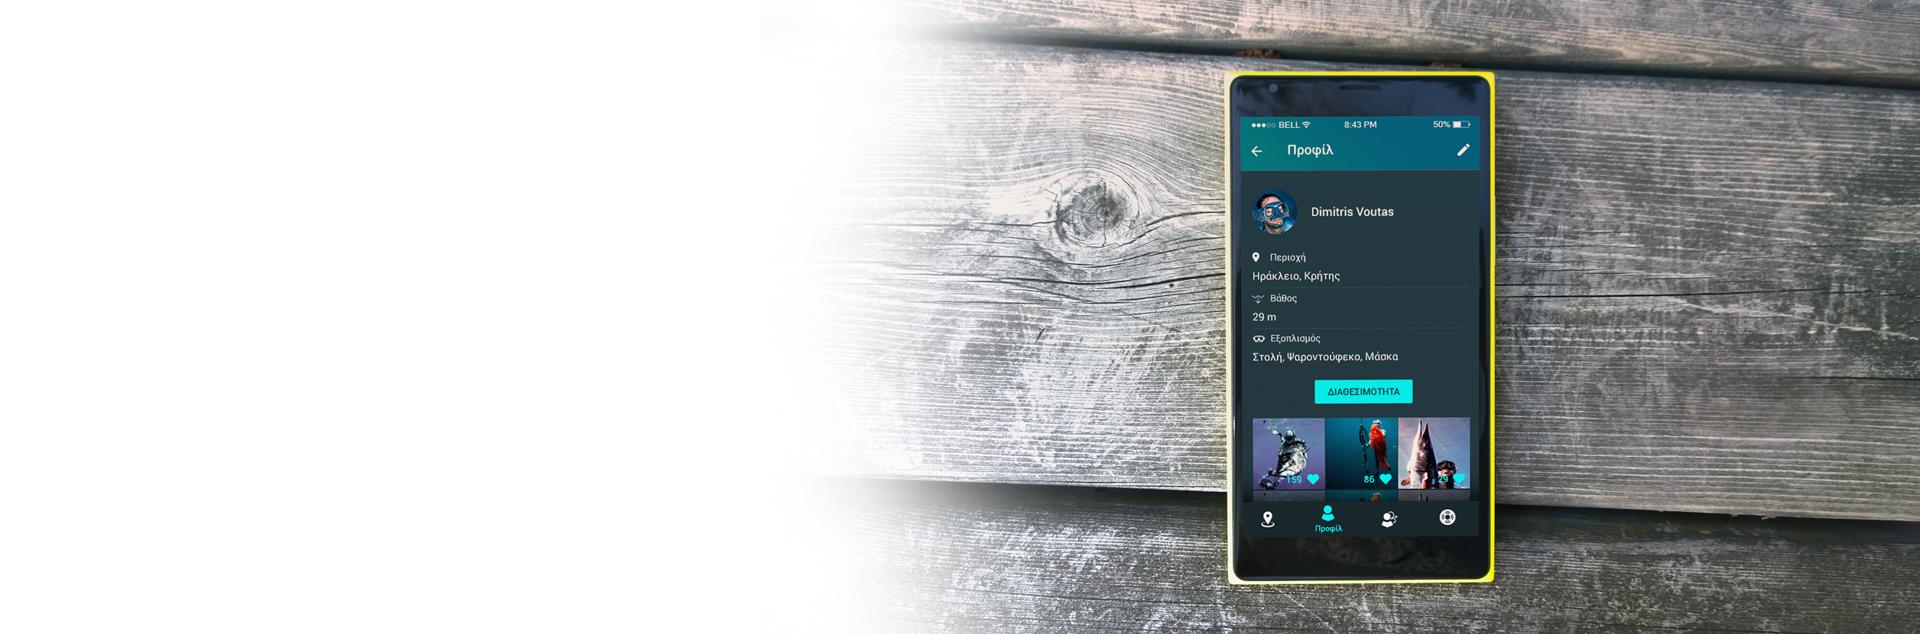 BlueSpear mobile app - profile